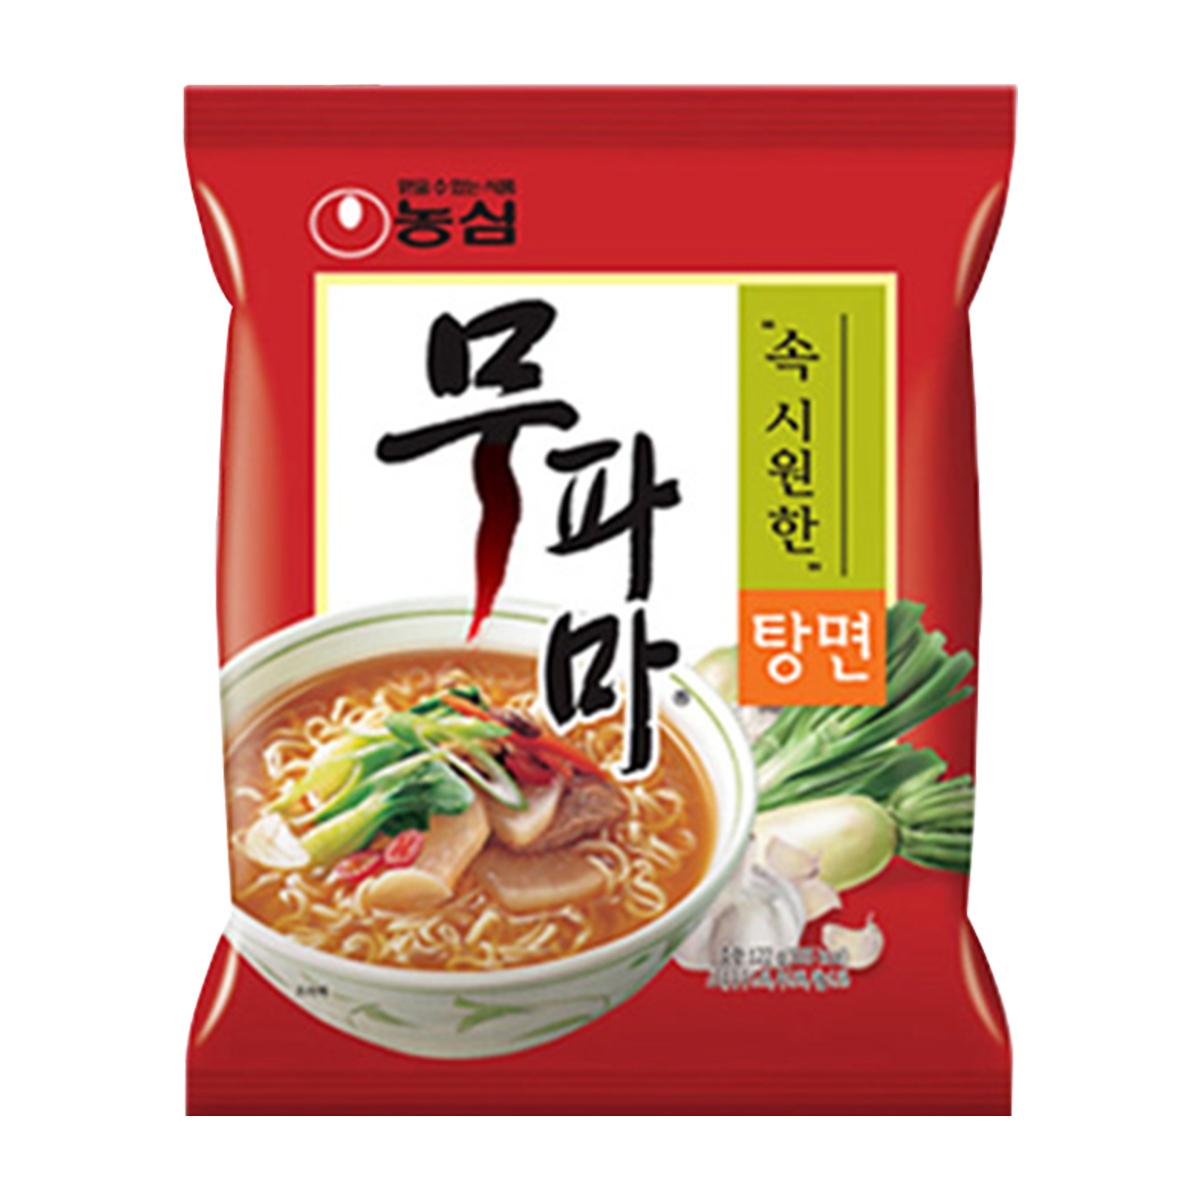 Lamen Coreano Vegetariano Picante Mupama Tangmyun Nongshim - 122 gramas